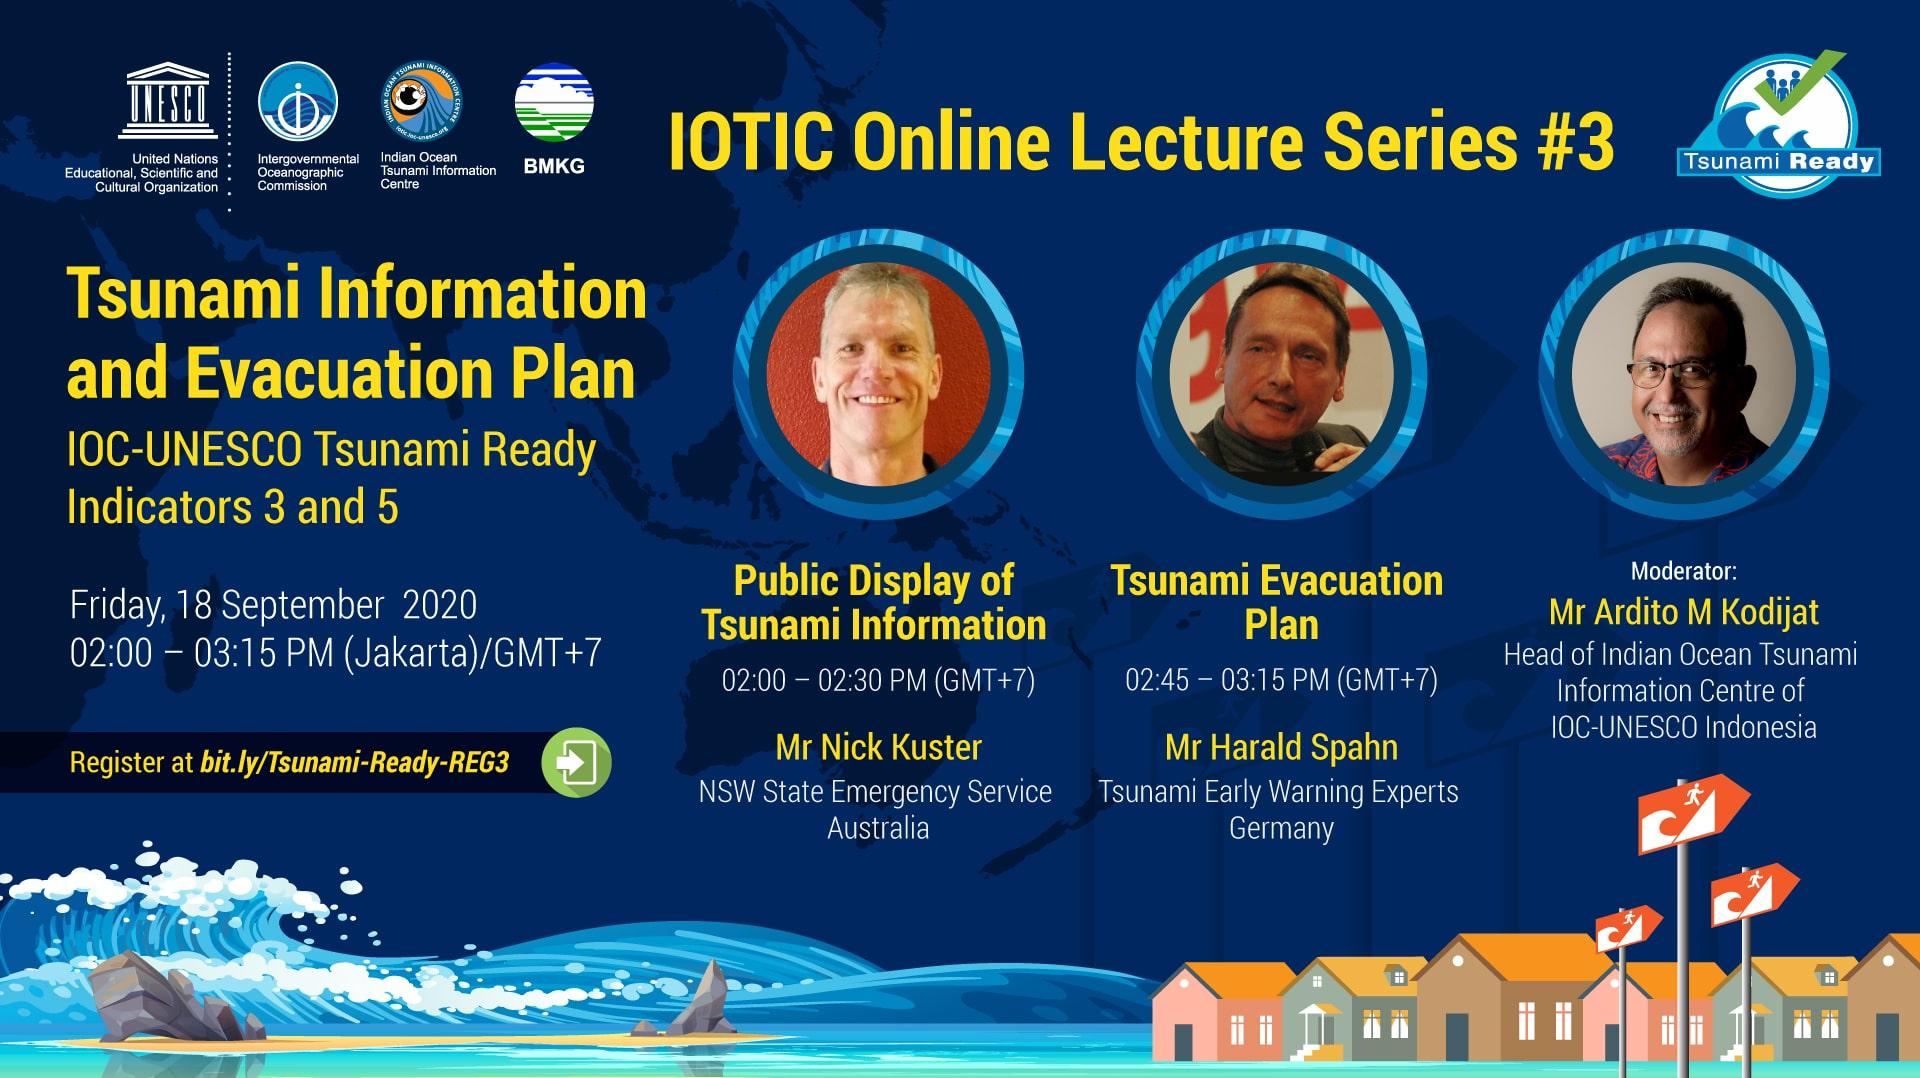 IOTIC Online Lecture Series #3